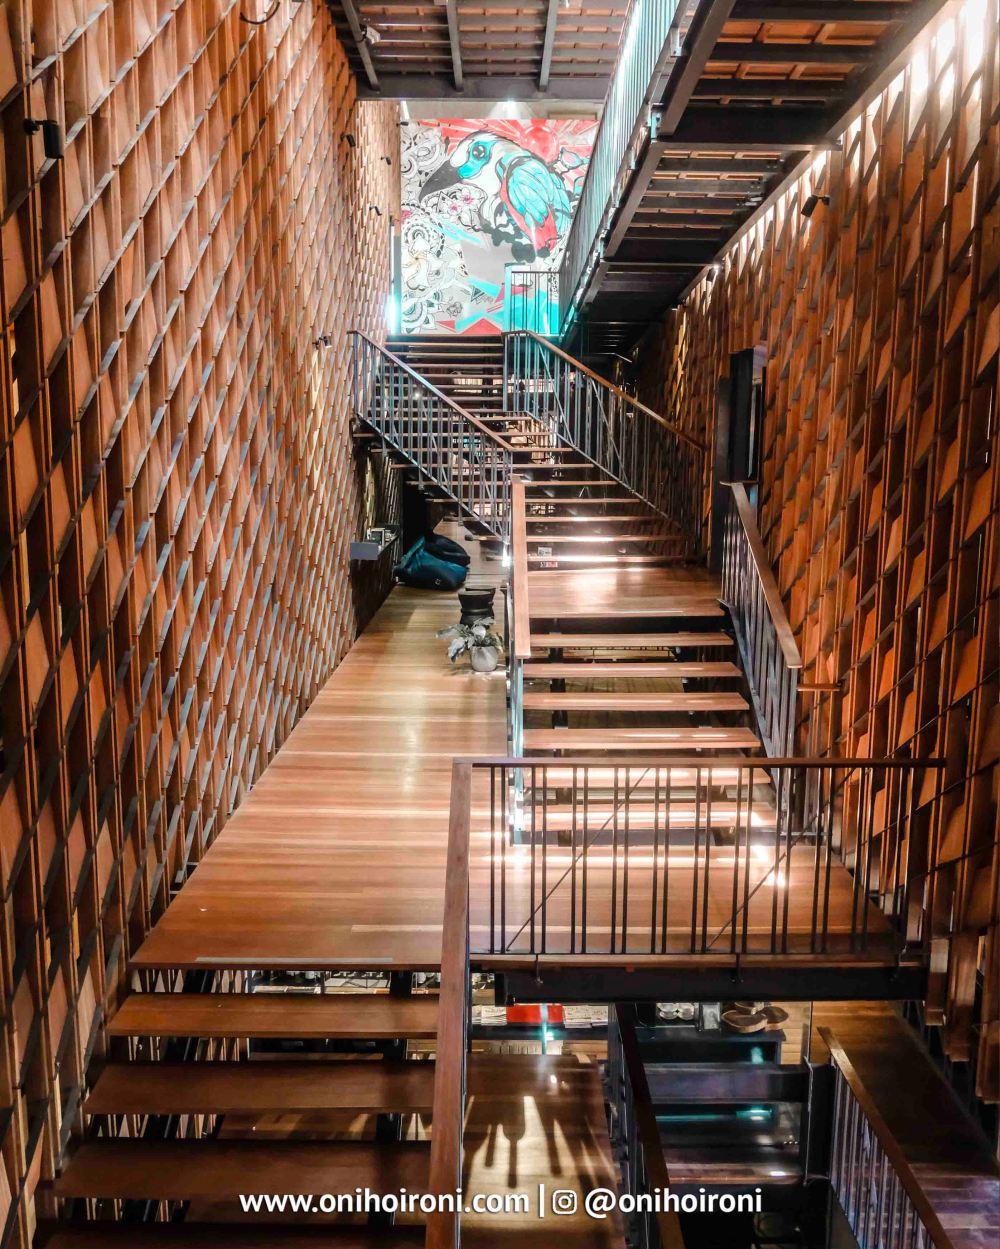 1 Lobby Artotel Sanur, Bali Oni Hoironi copy